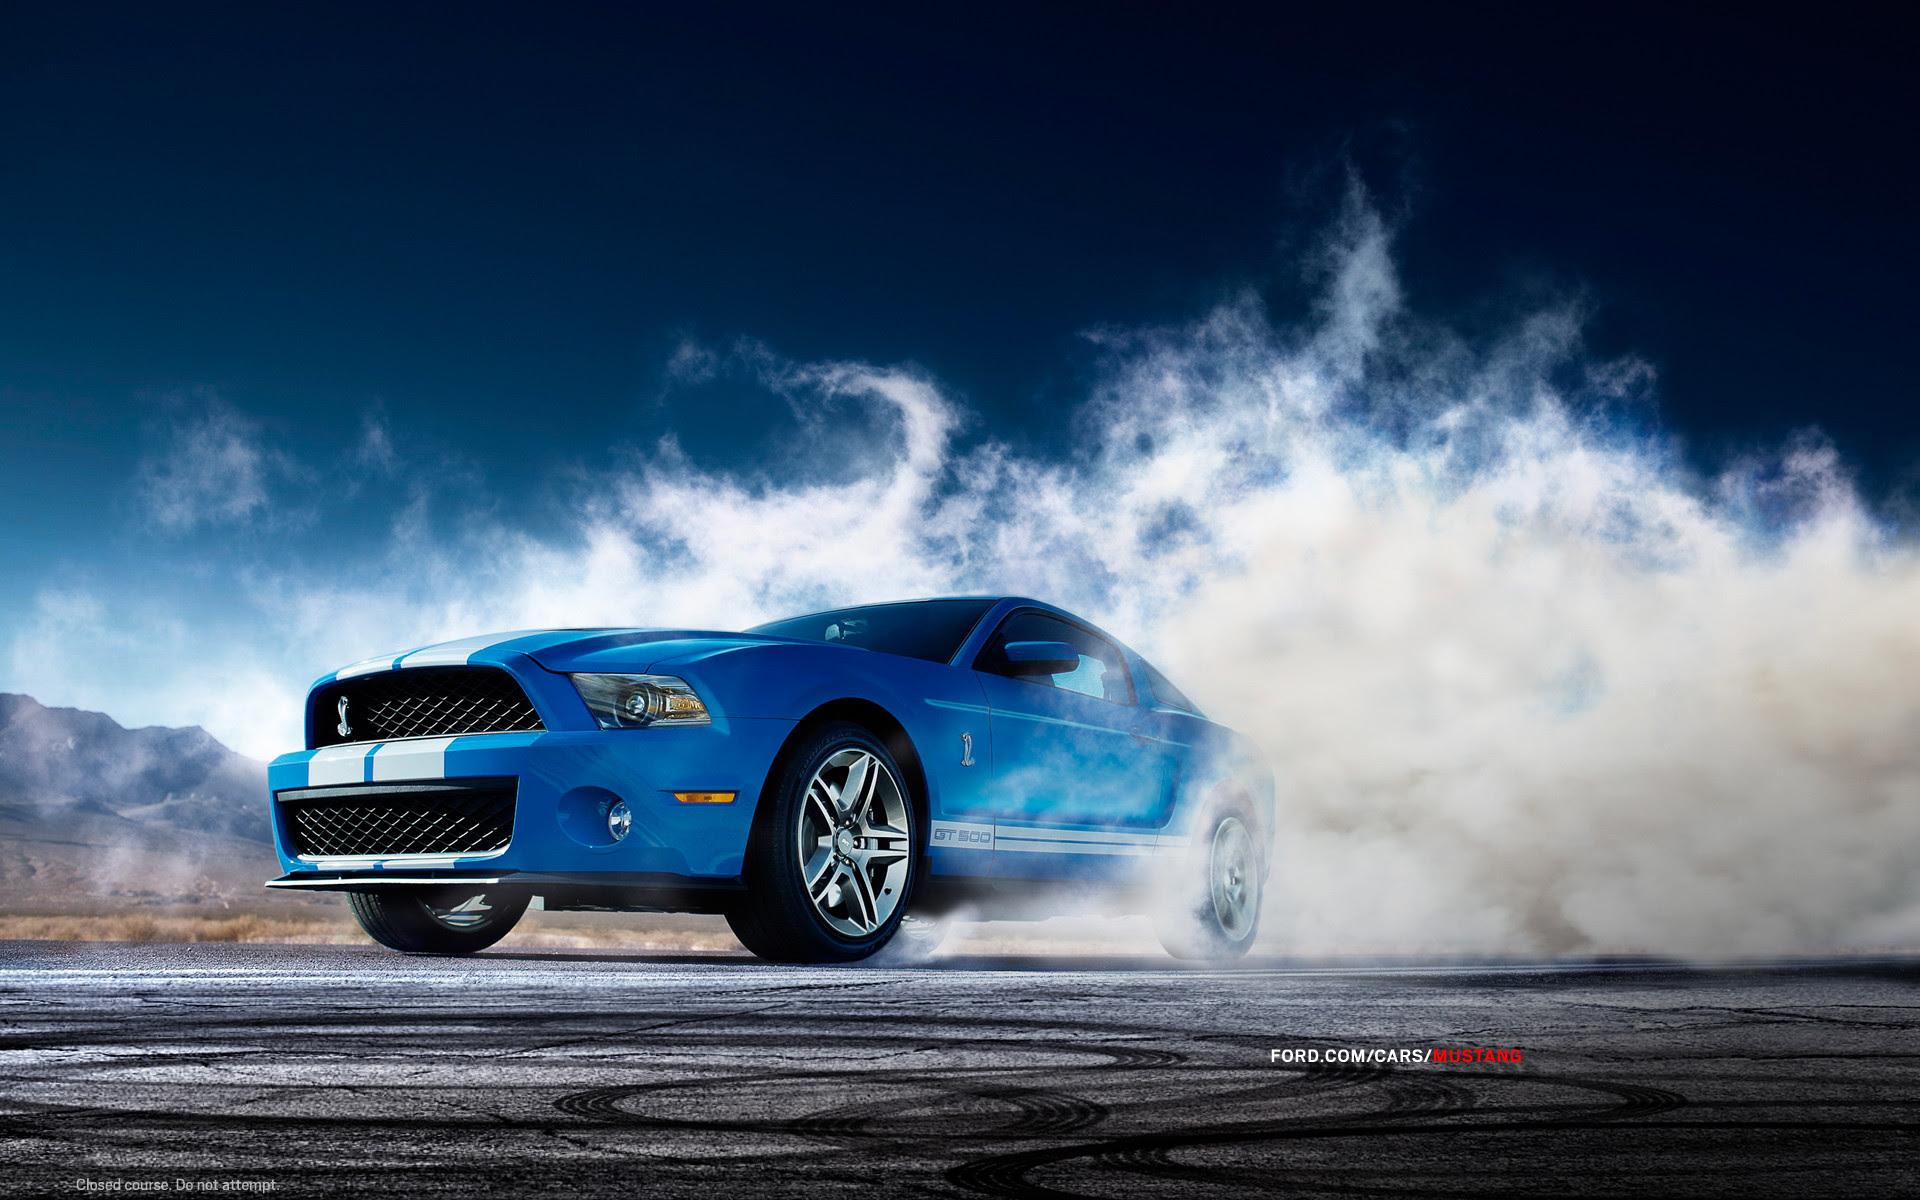 Mustang Desktop Wallpaper (71+ images)